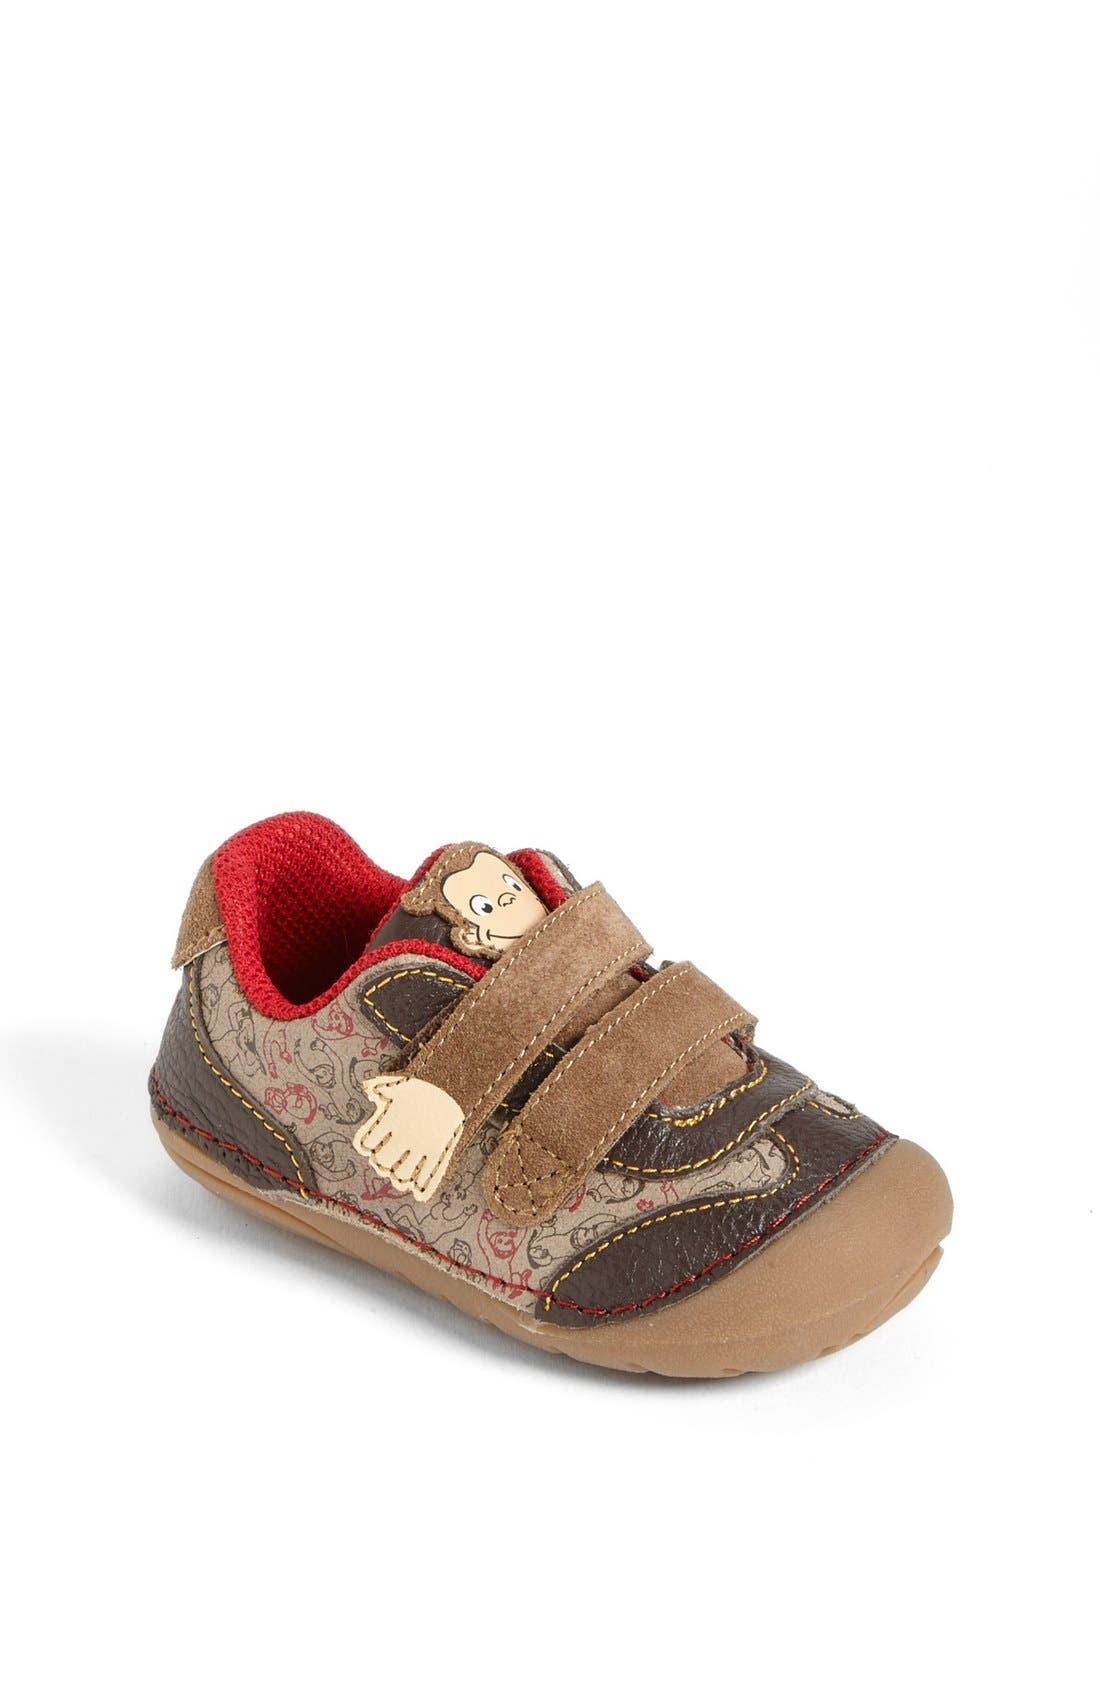 Main Image - Stride Rite 'Curious George' Sneaker (Baby & Walker)